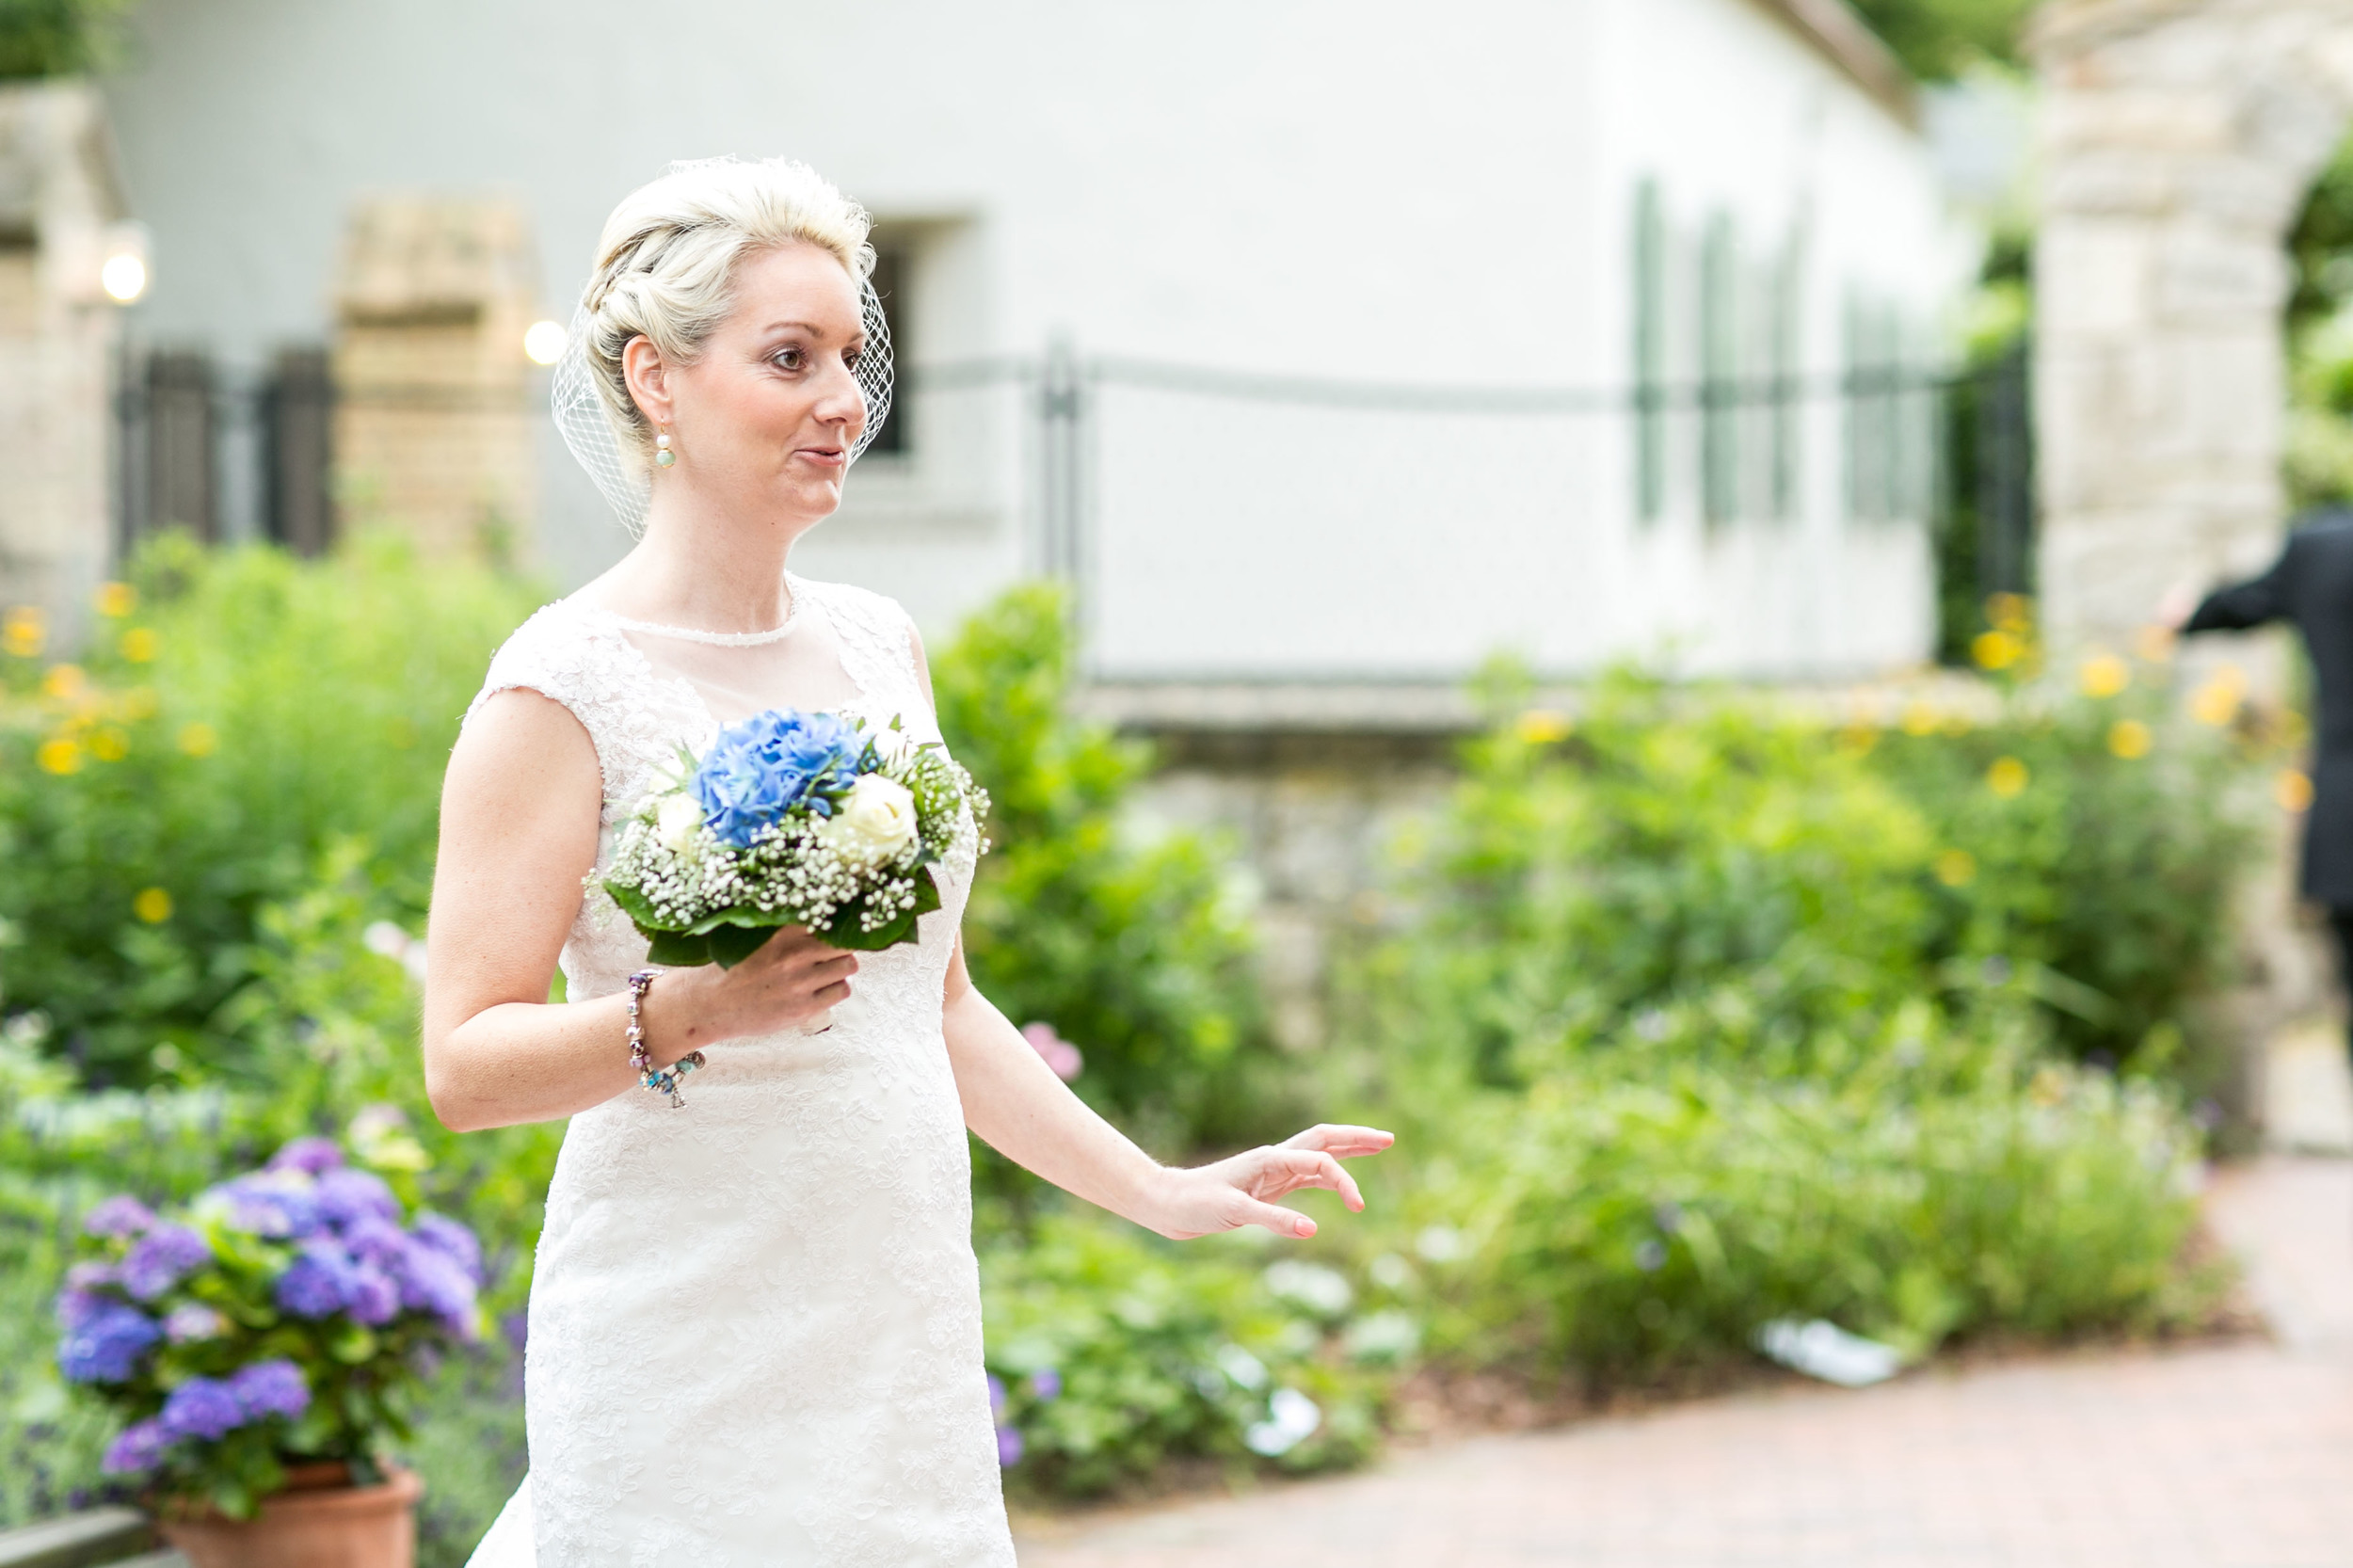 Hochzeitsfotografie Berlin_Fran Burrows Fotografie_8.jpg